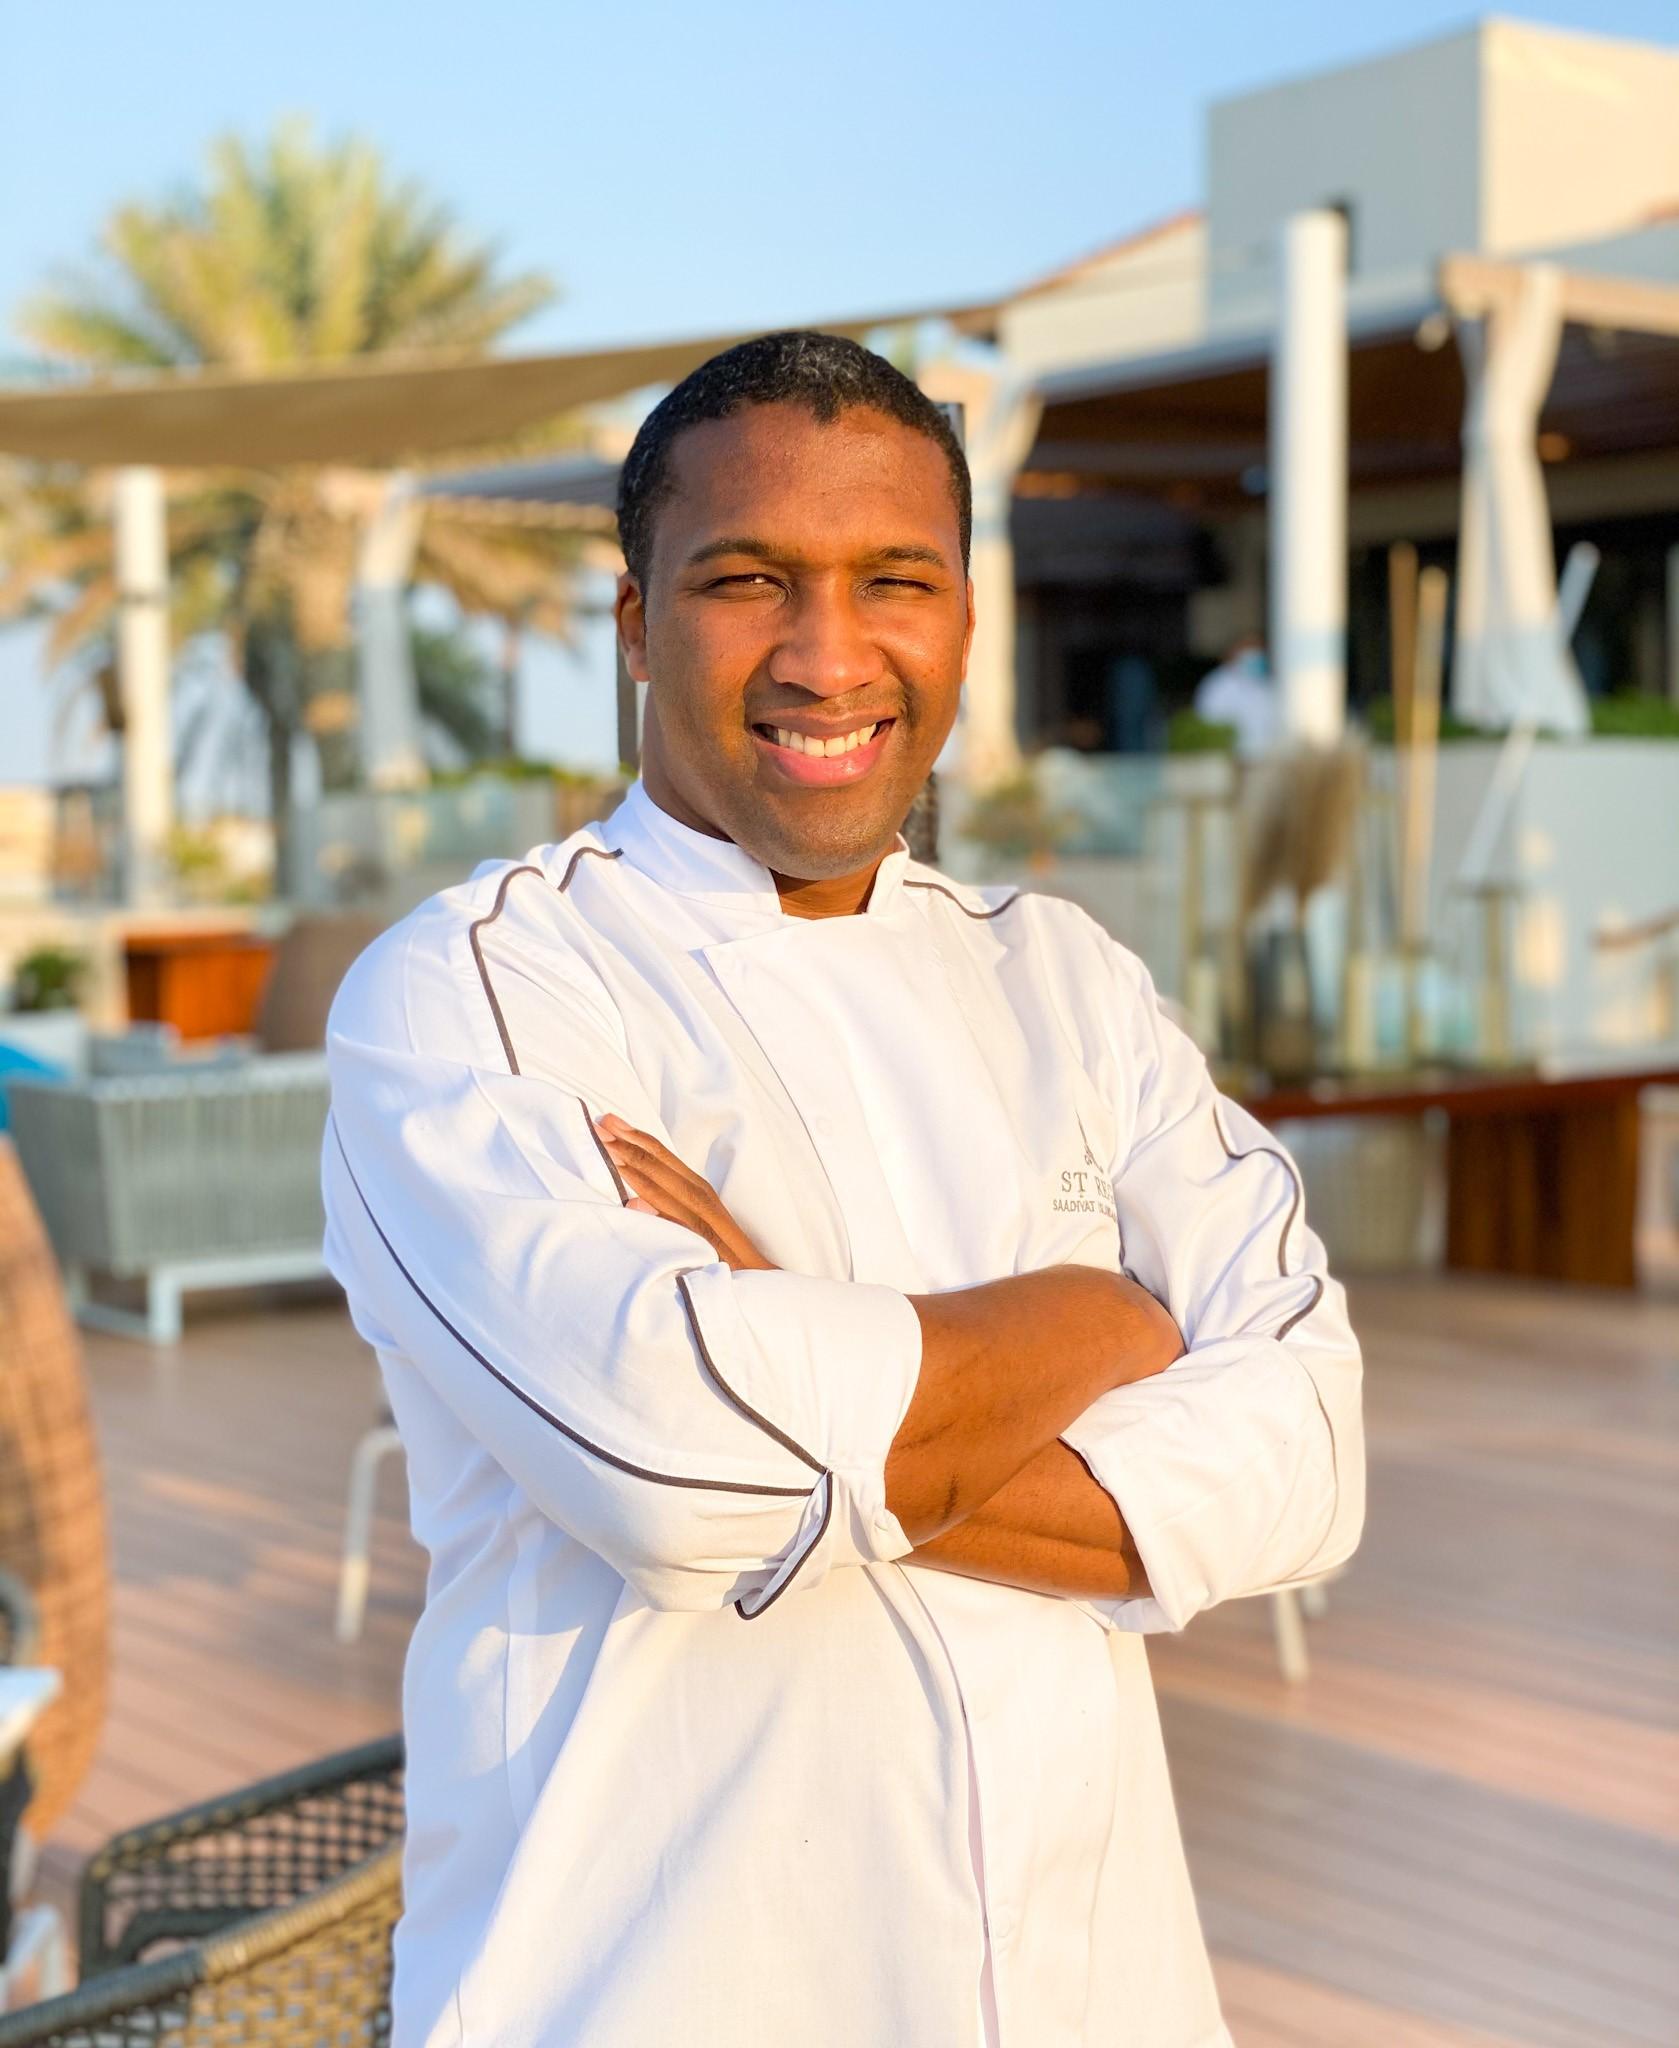 Chef Renzo Martin Reyes Reyes joins The St. Regis